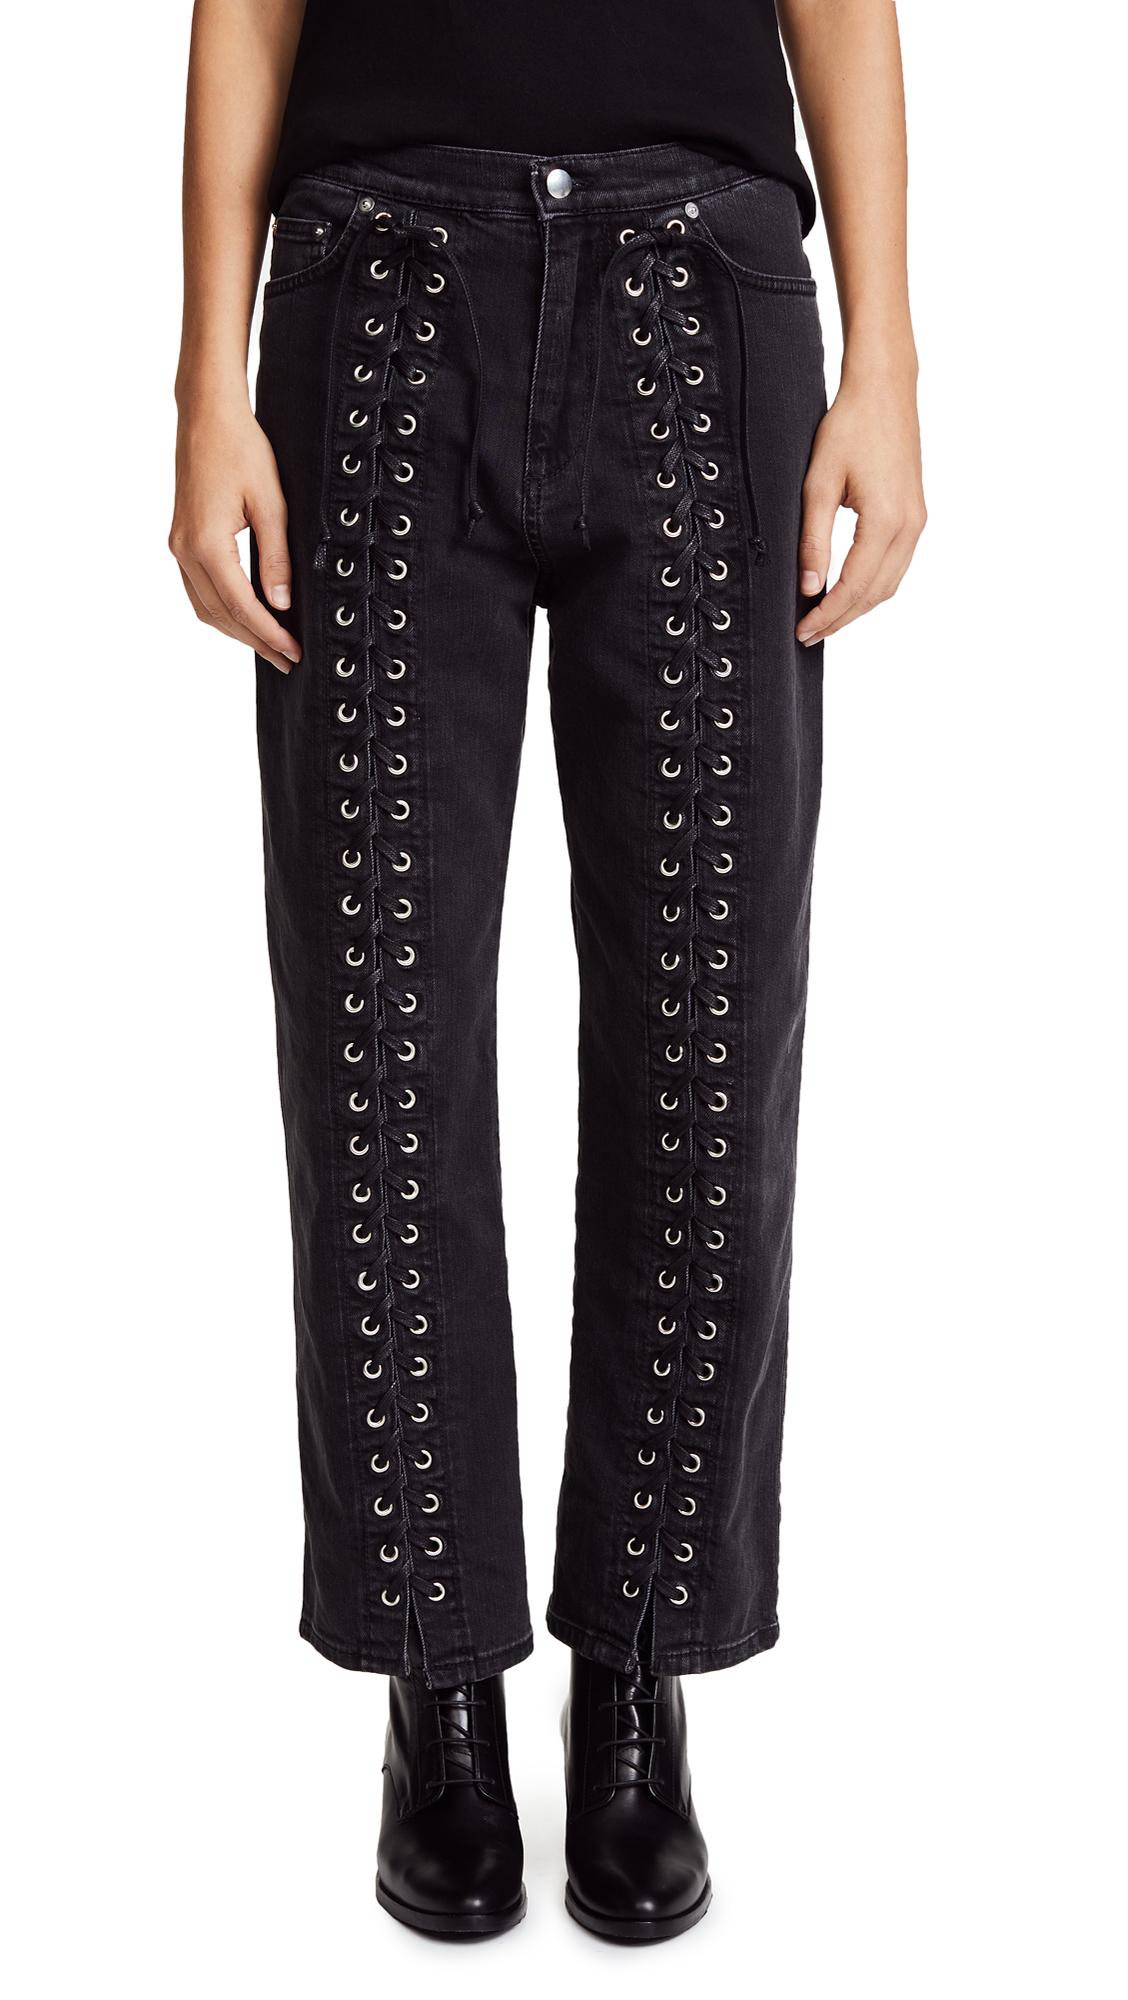 McQ - Alexander McQueen Front Lace Jeans